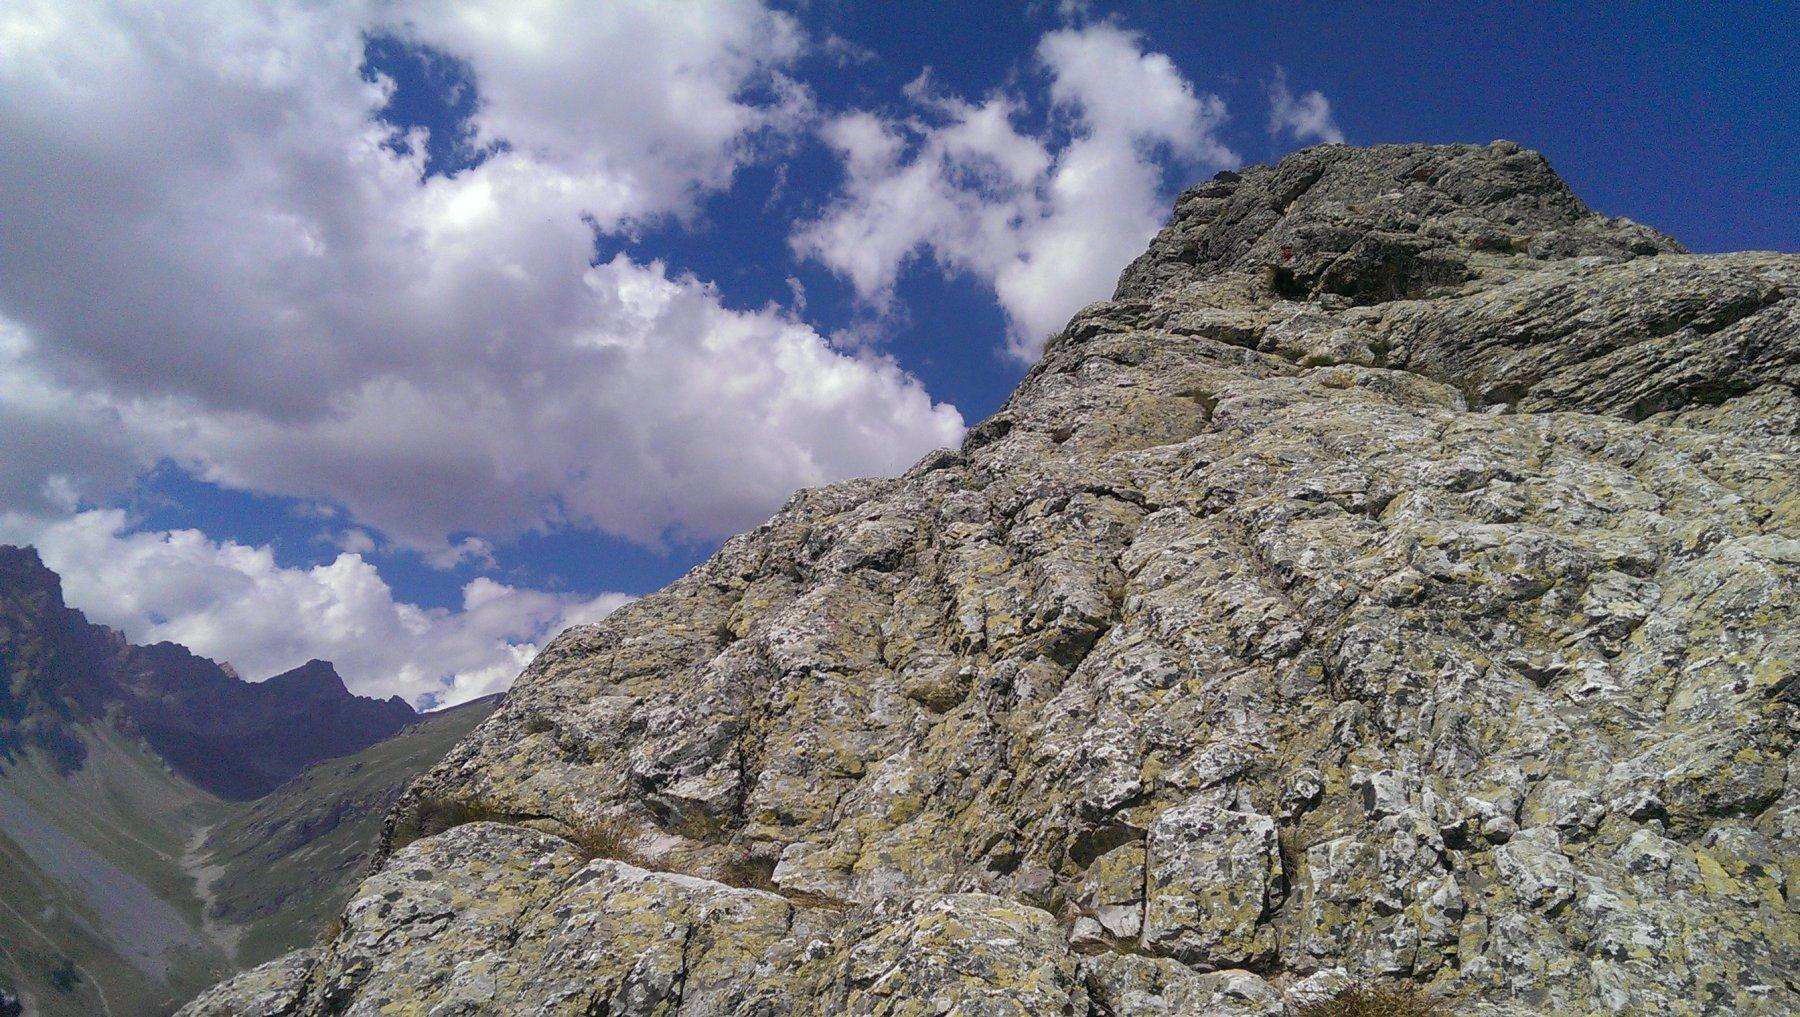 parte panoramica in cresta a metà via circa